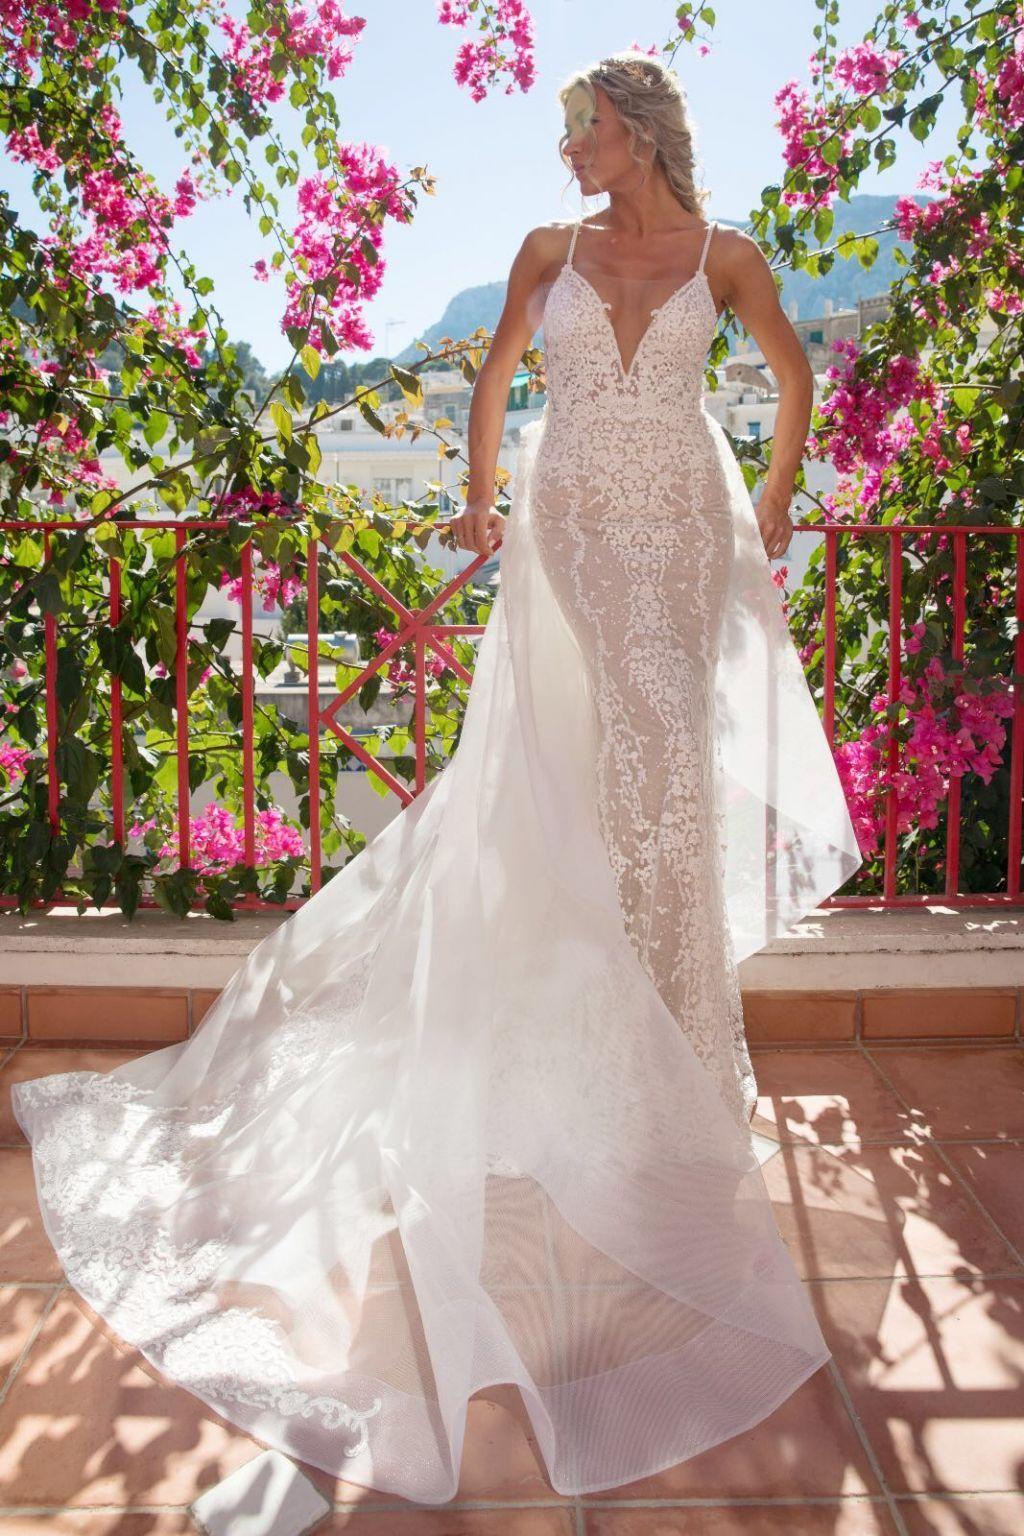 Berta 20 20 Wedding Dress   Used, Size 20, €20,20   Wedding ...